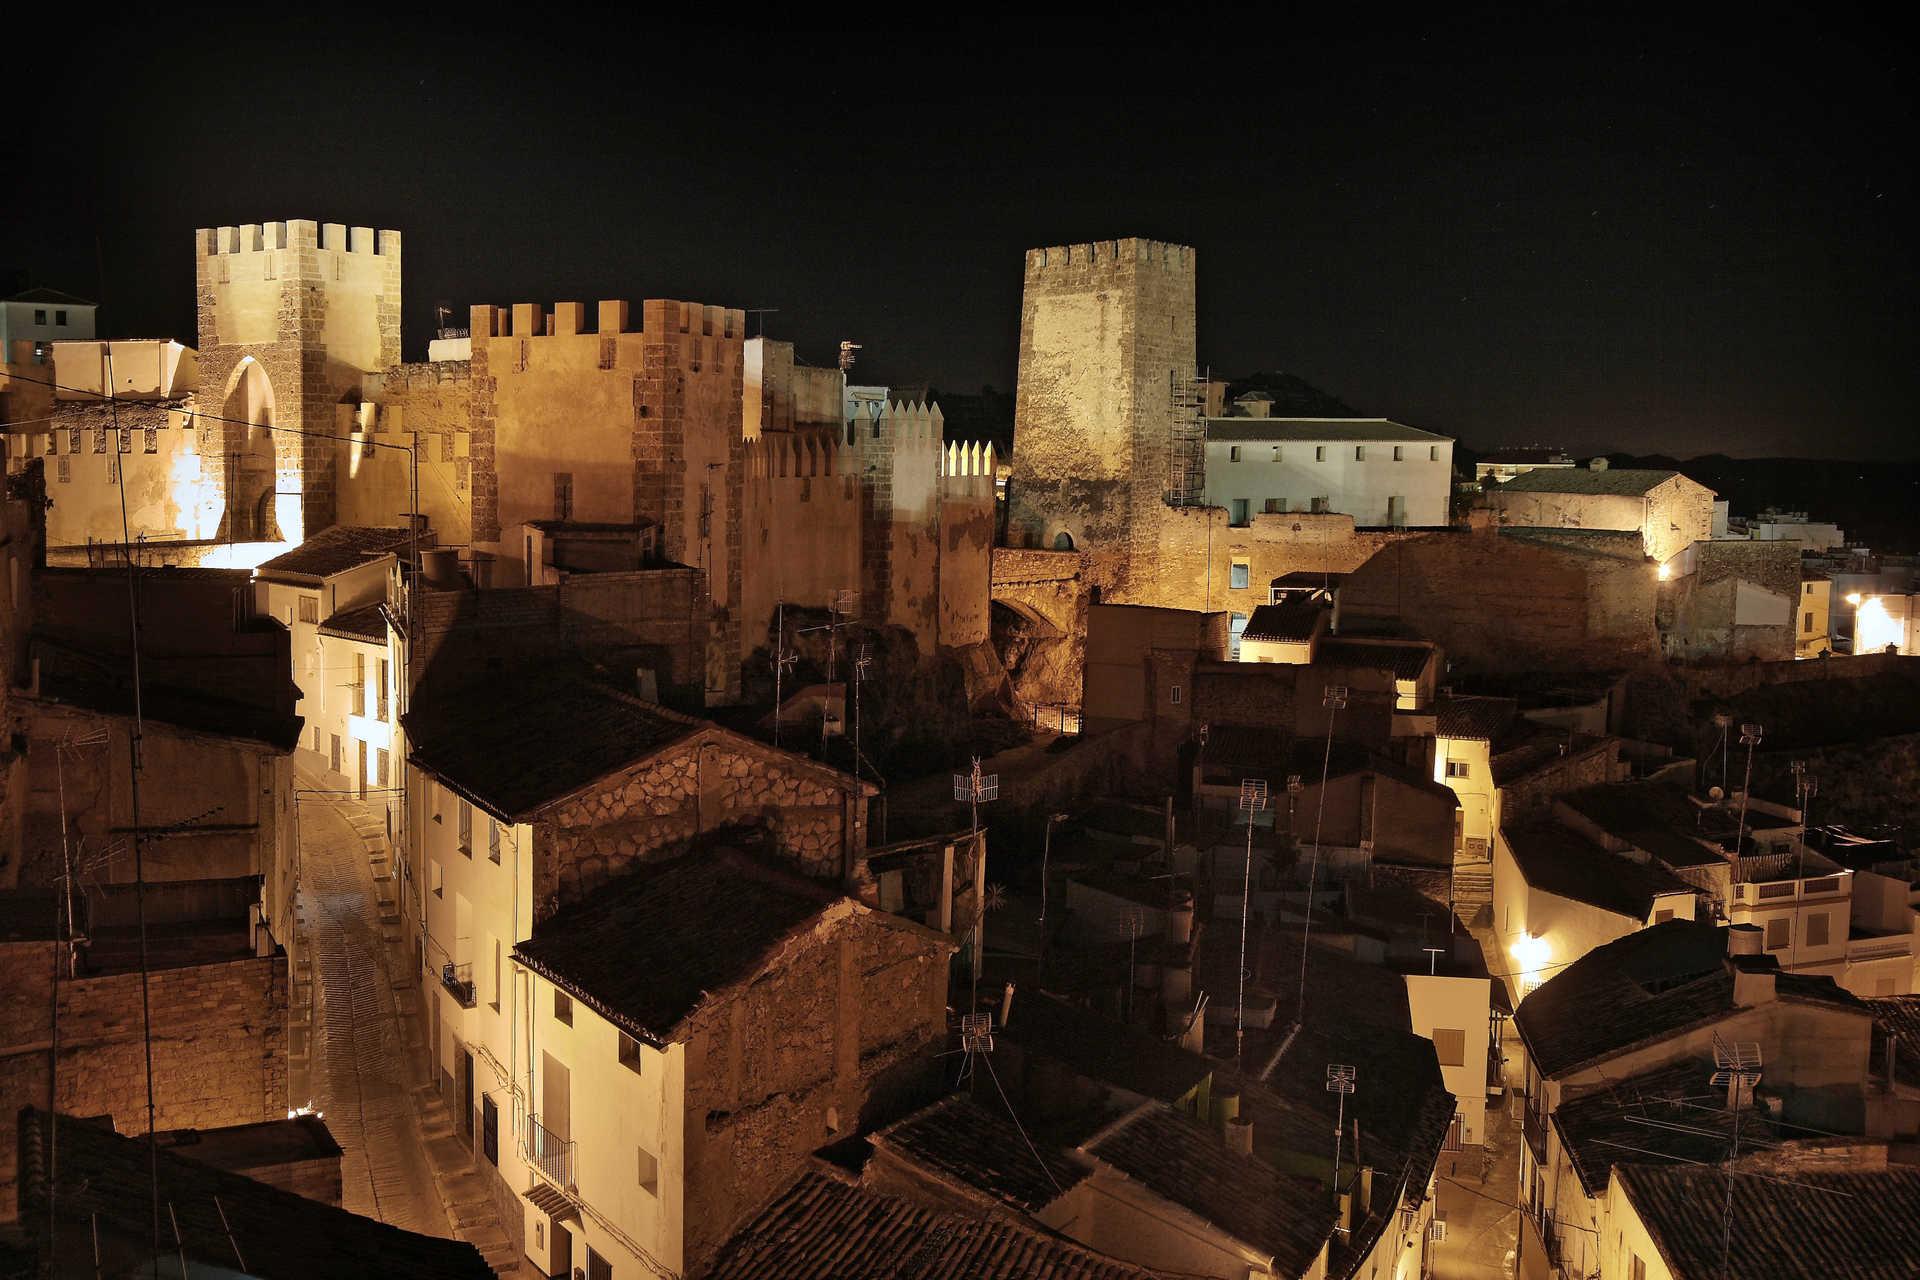 Castillo de Buñol